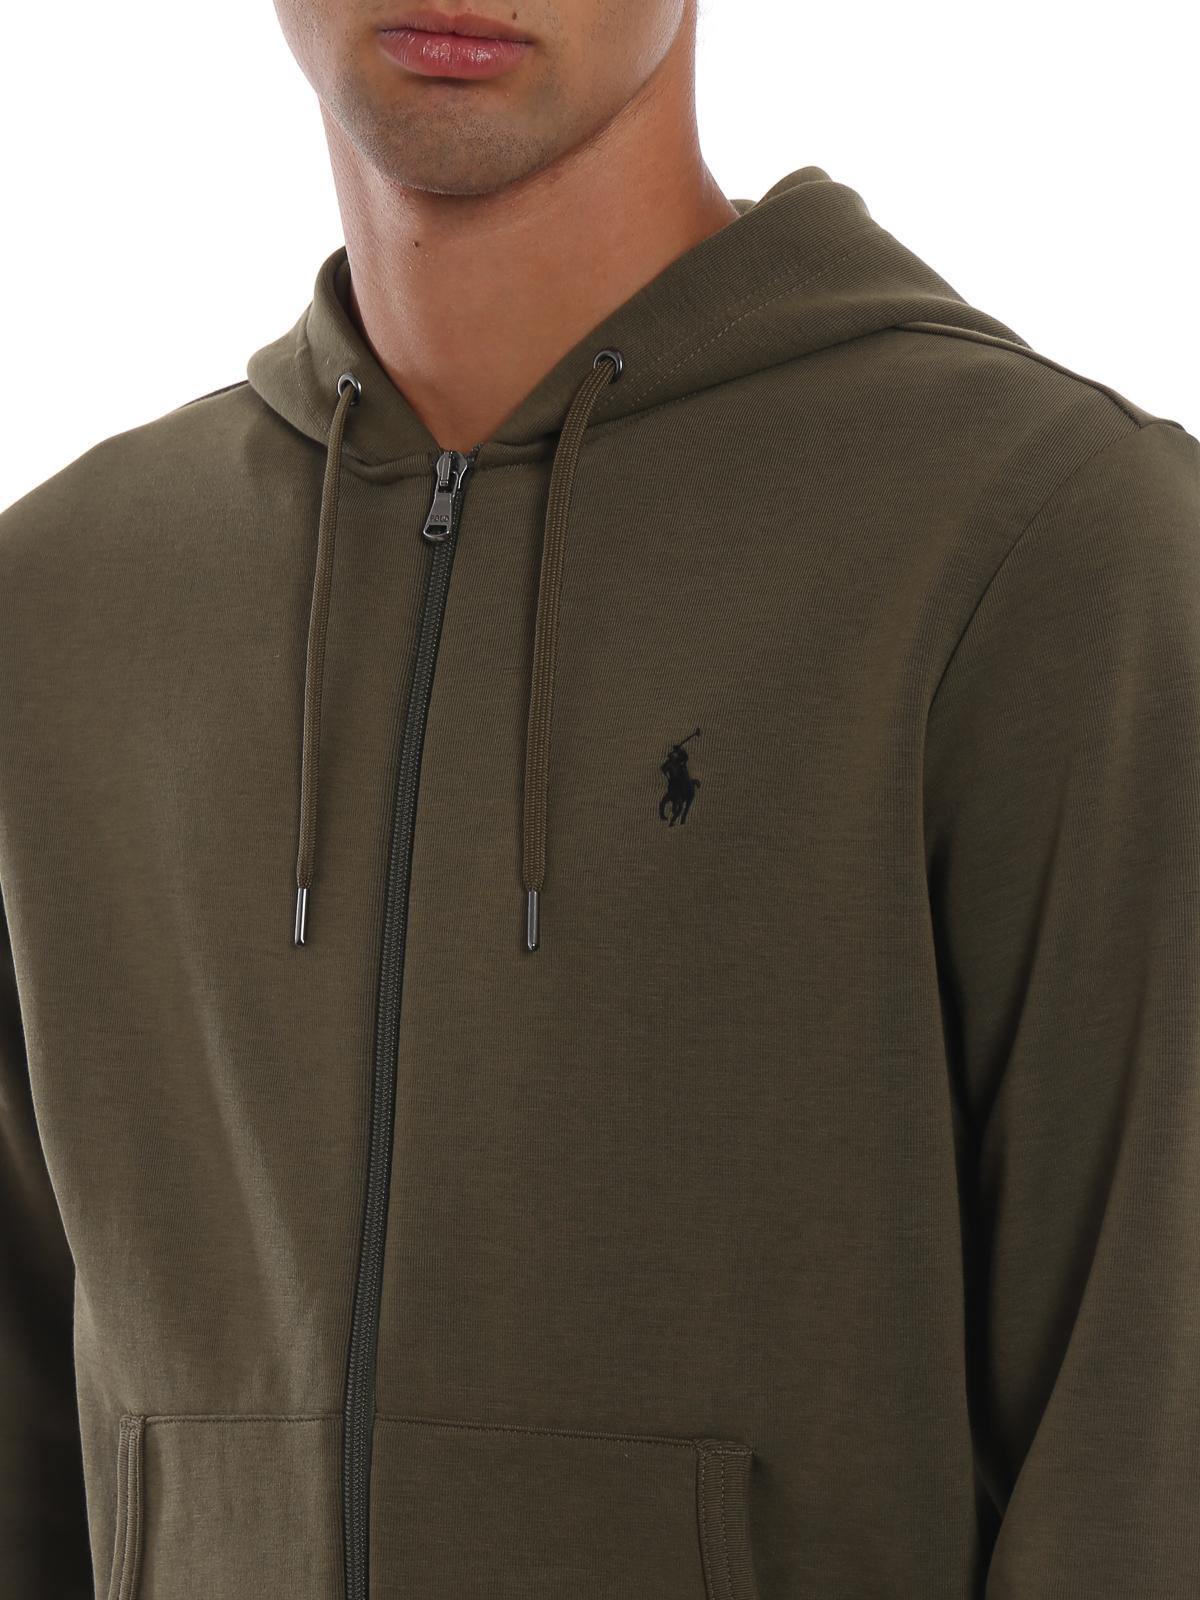 5ad94399c POLO RALPH LAUREN buy online Army green classic cotton blend zip hoodie